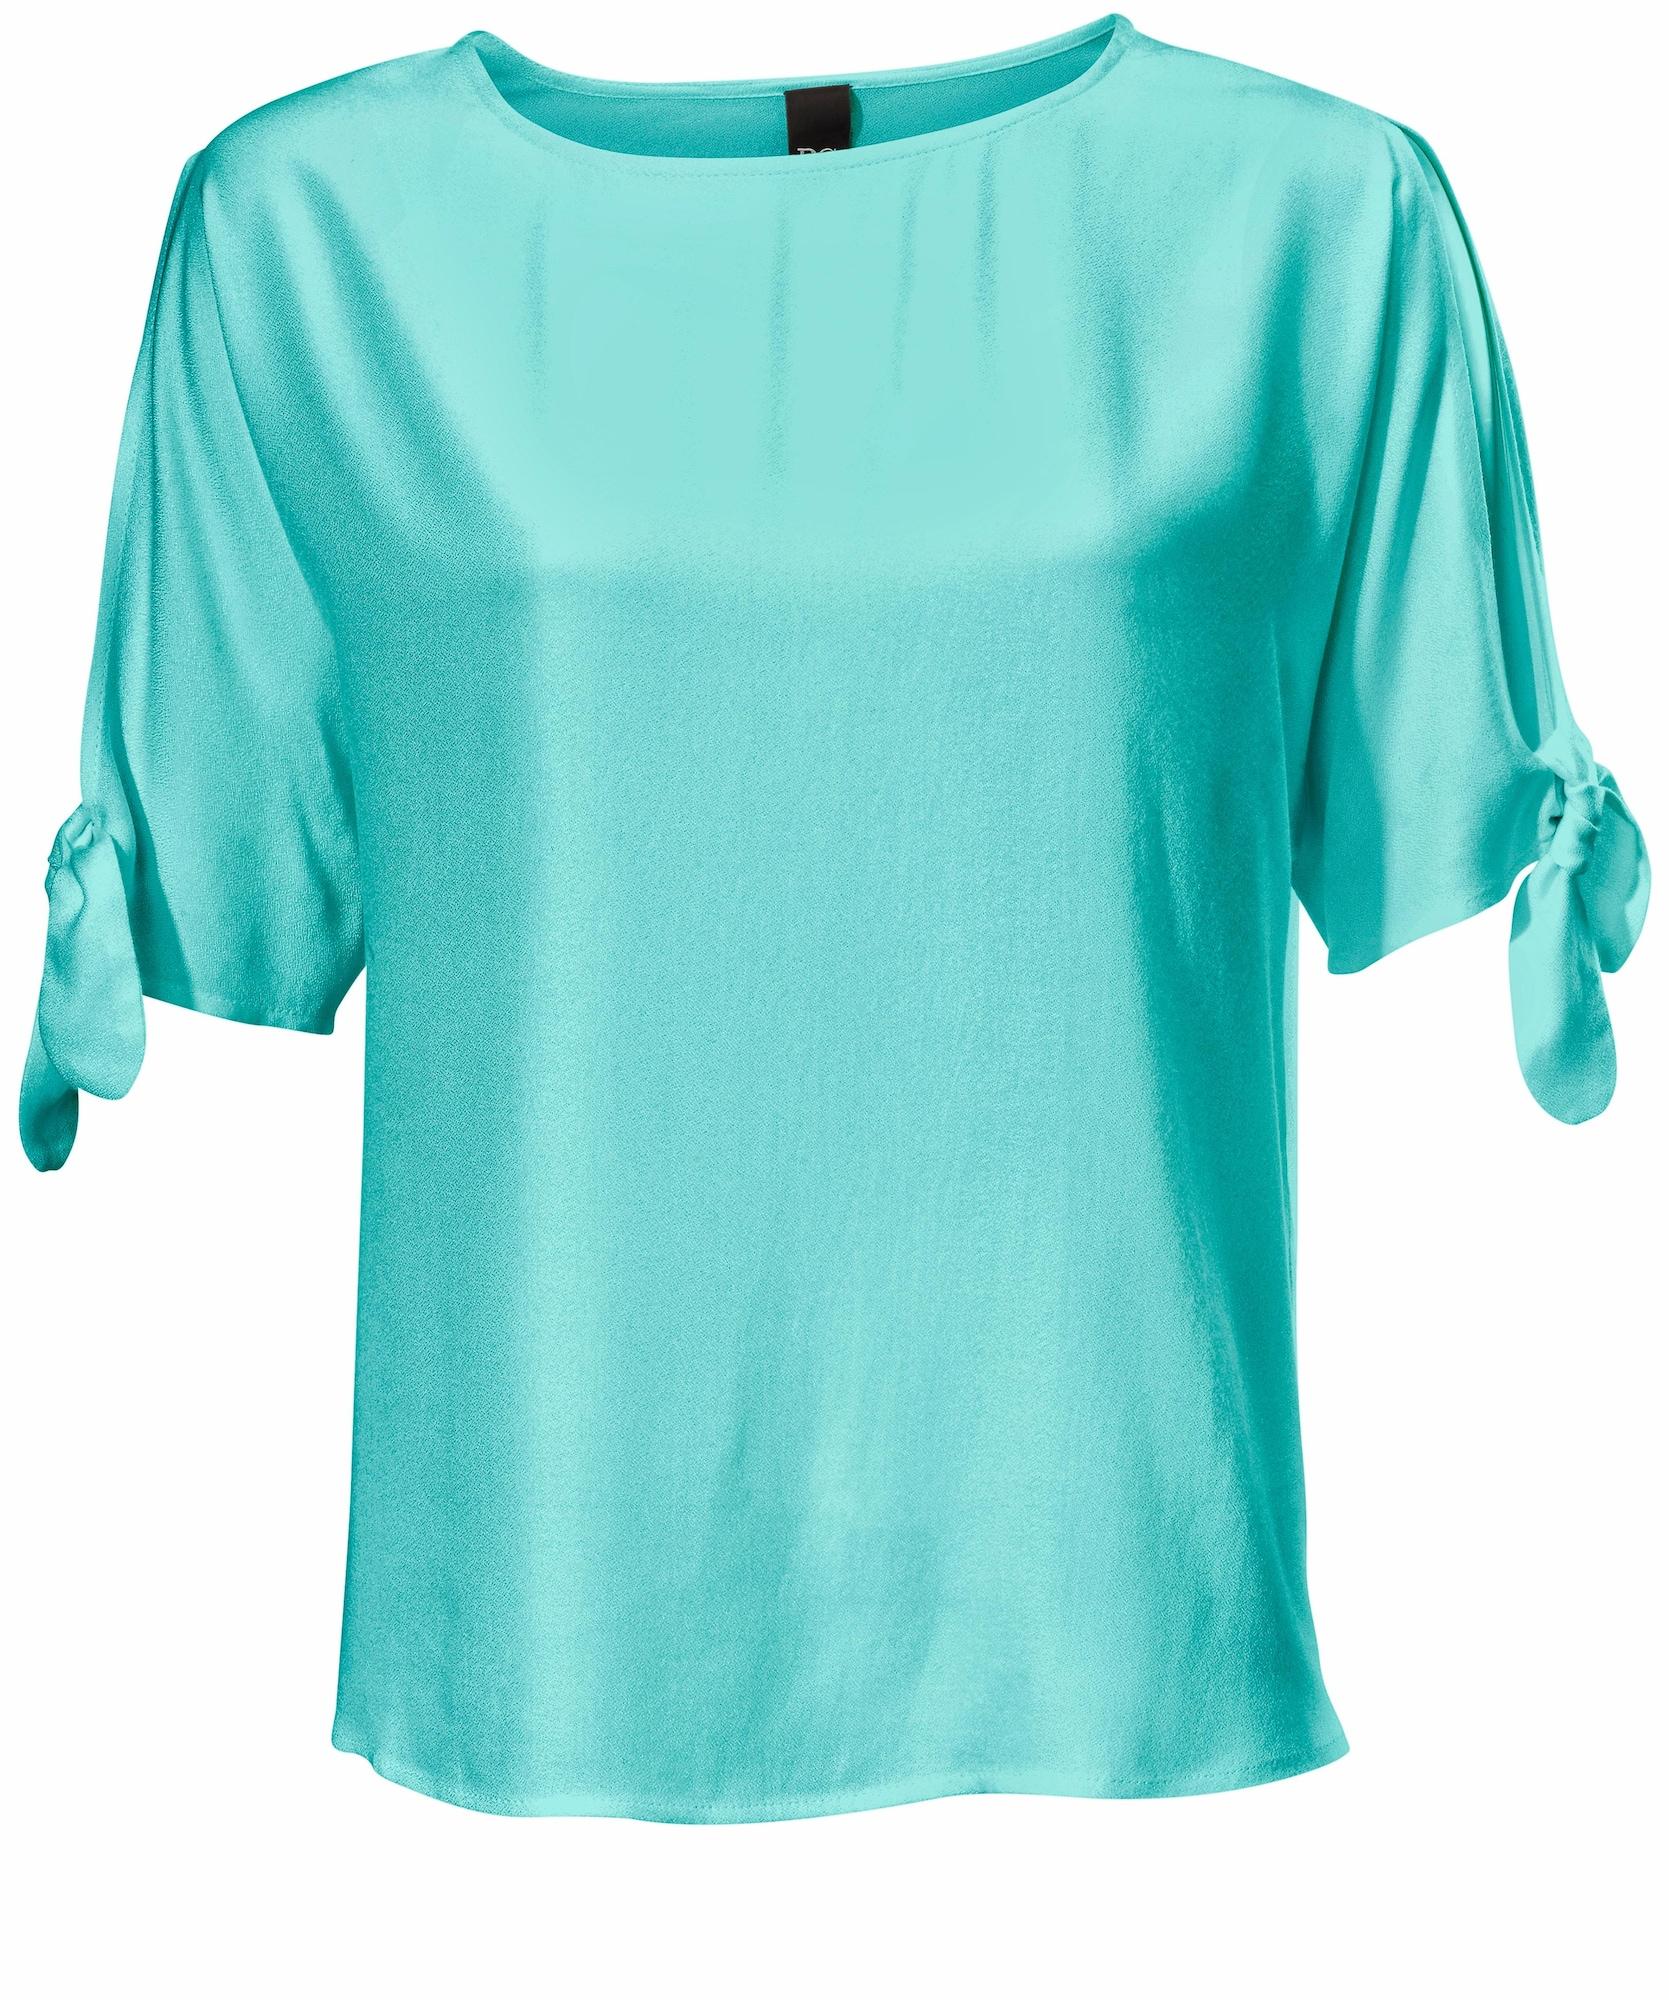 Heine, Dames Shirt, turquoise